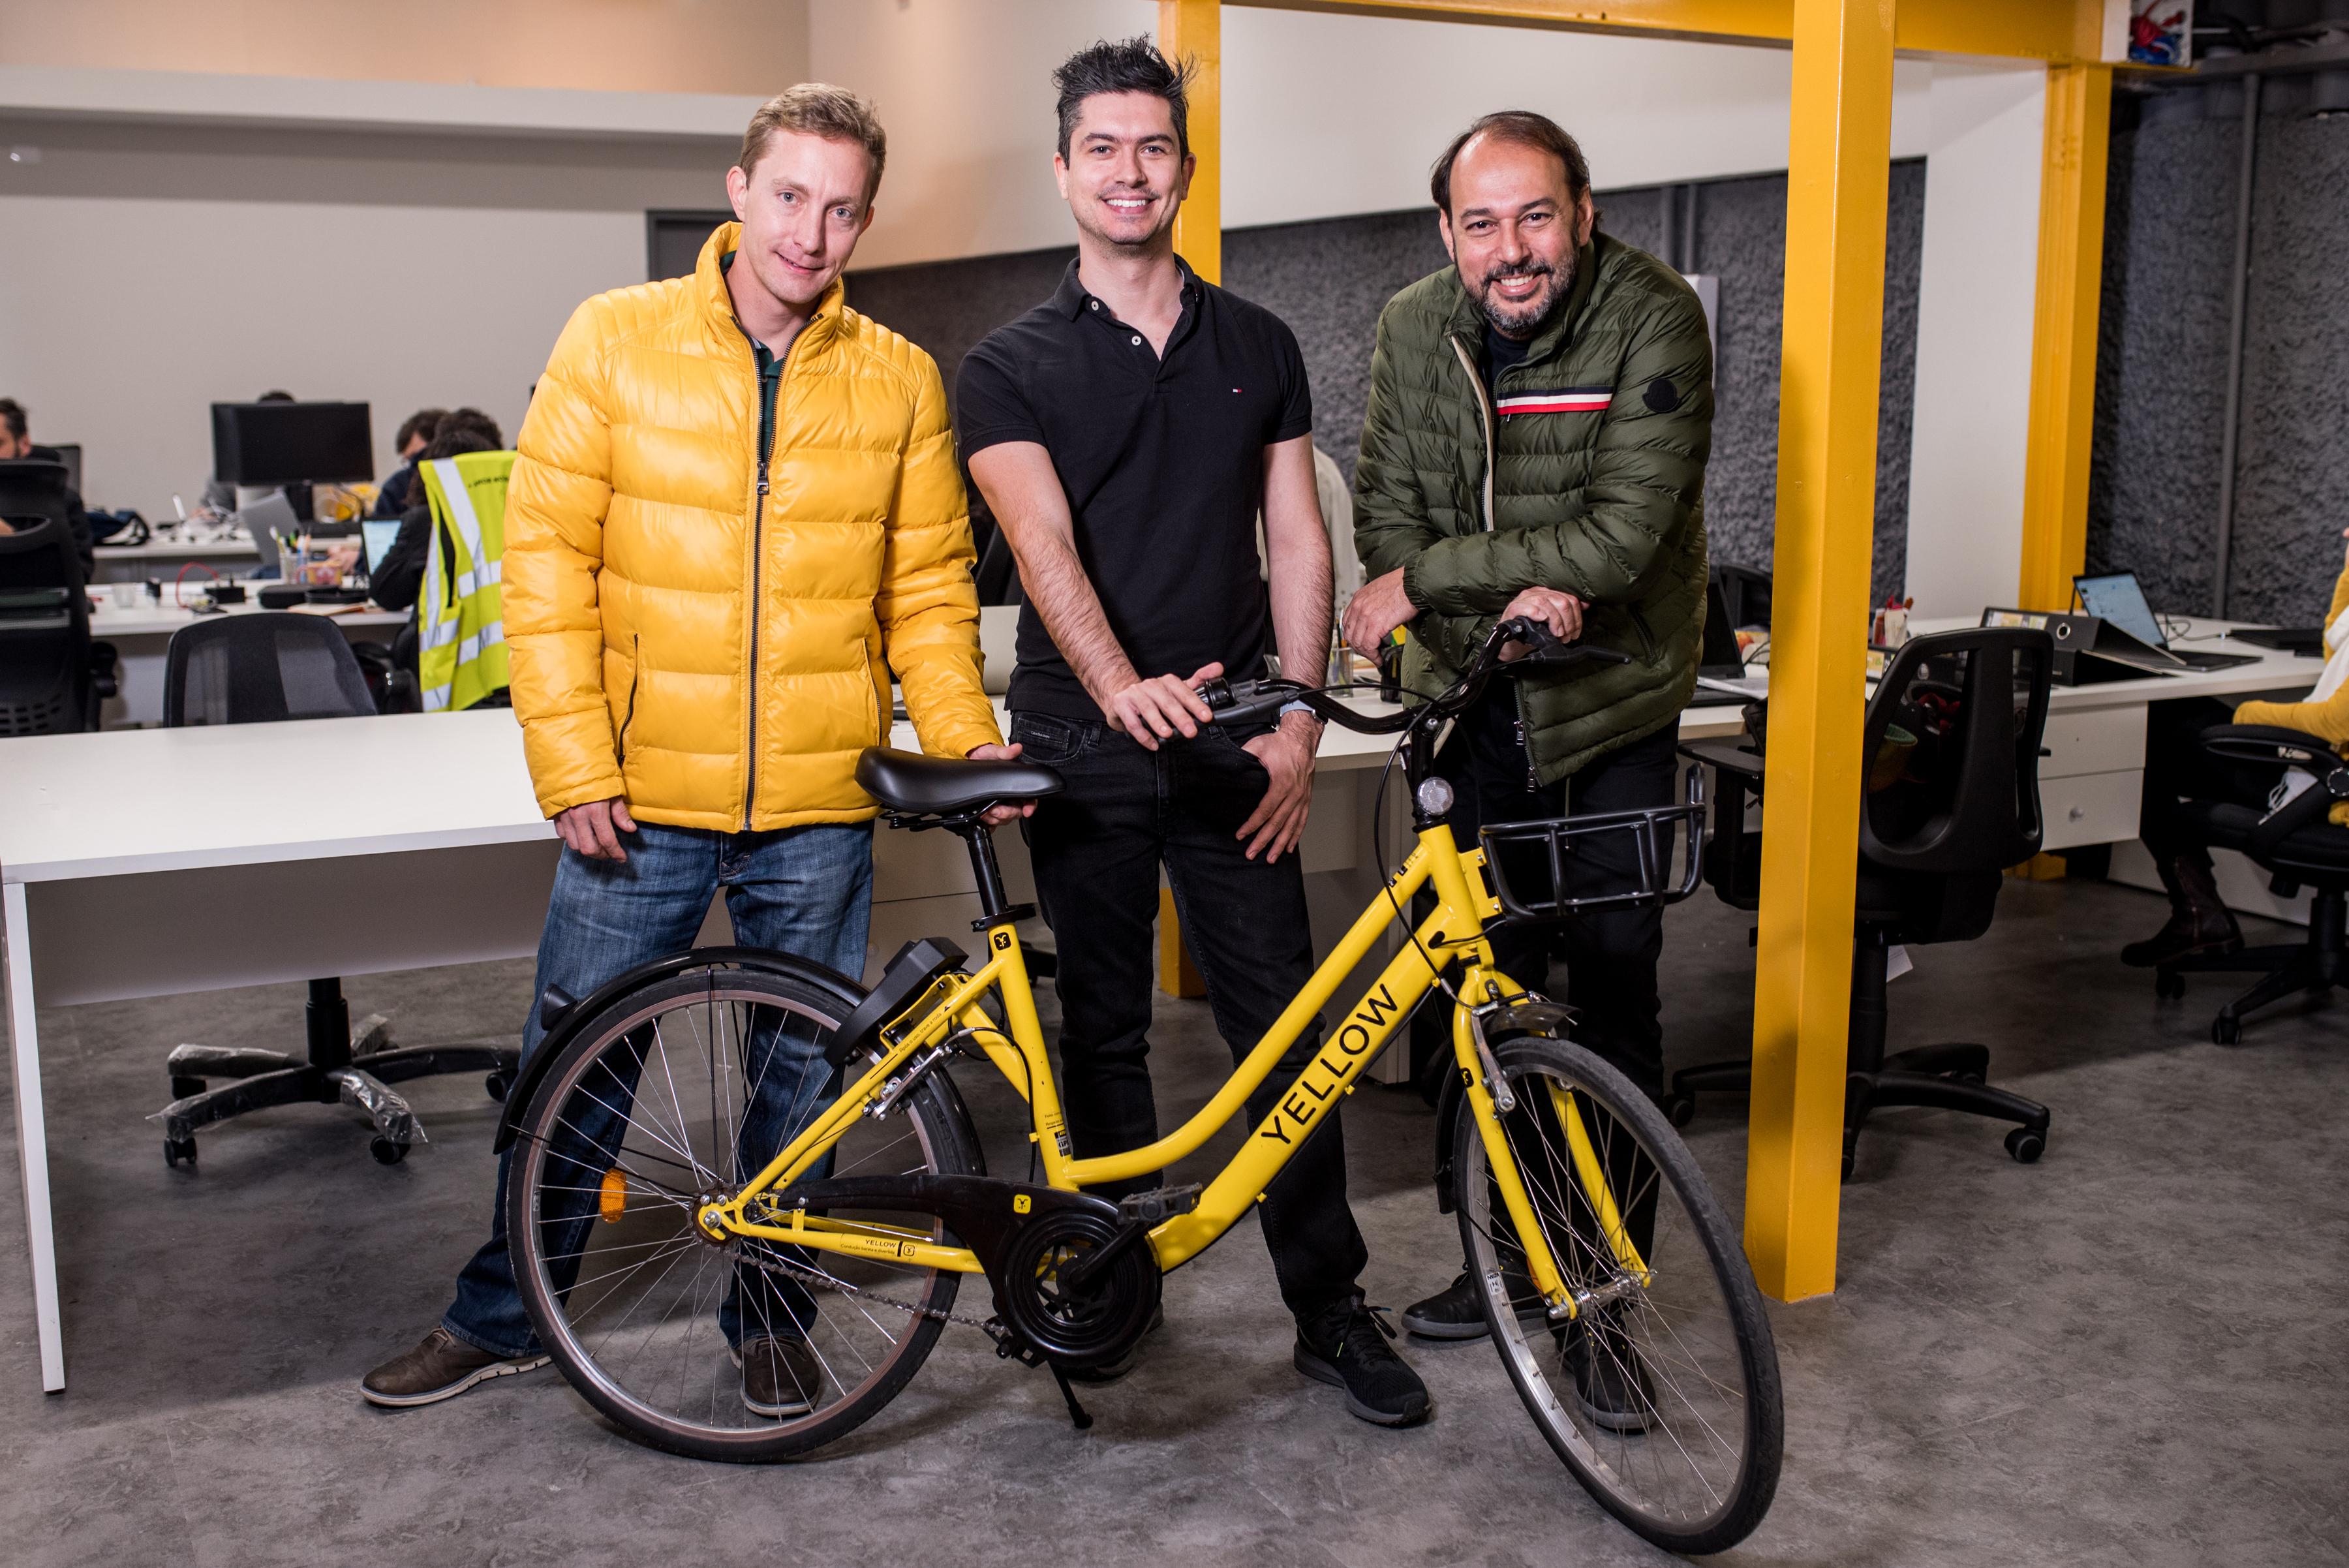 yellow bike, bike sharing, bicicleta compartilhada